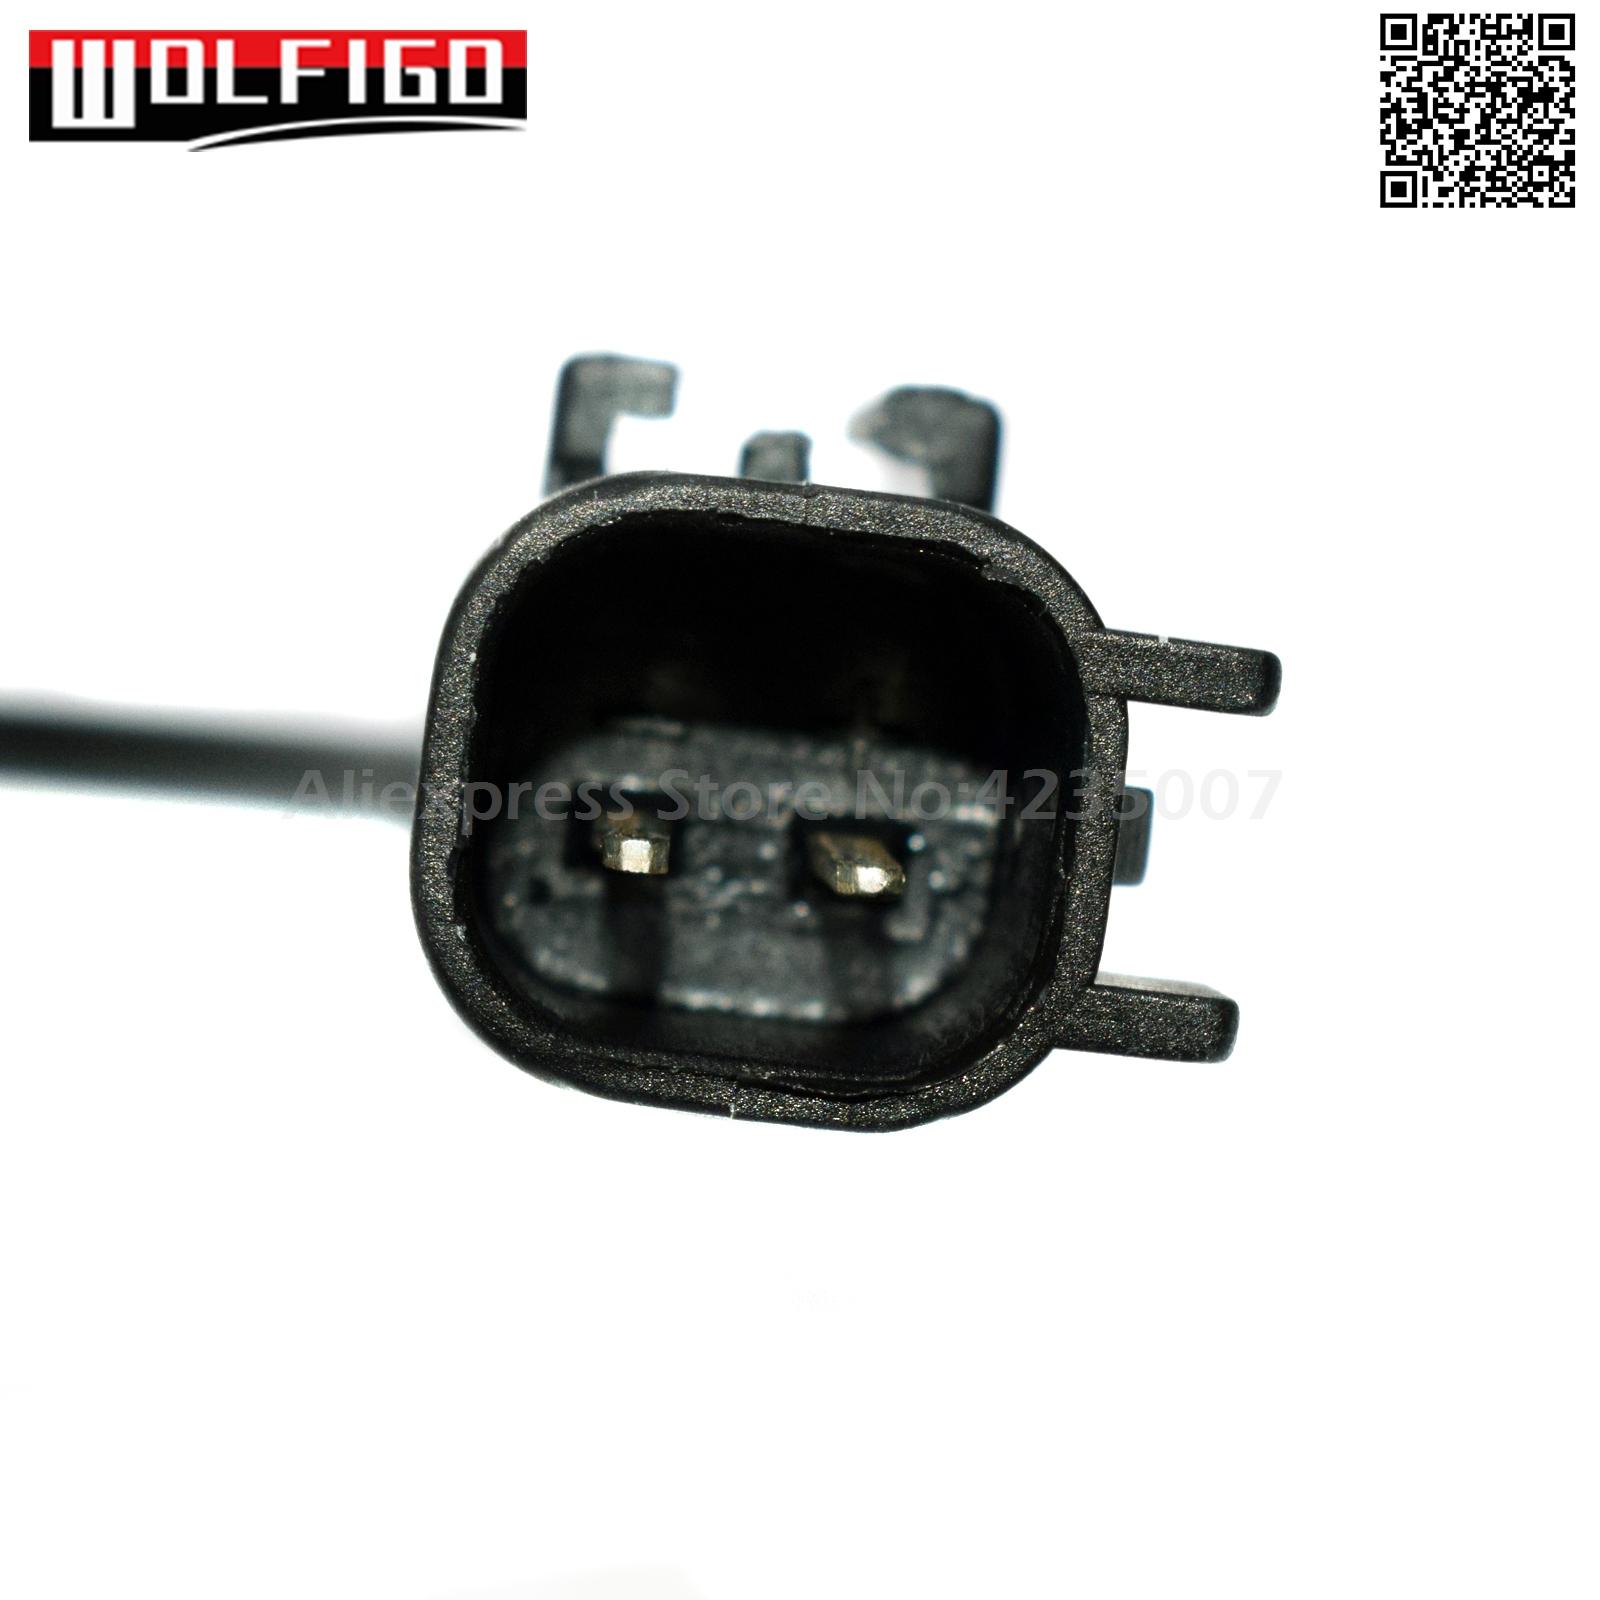 1 Kit 56028668AE Electrical Connector of ABS Wheel Speed Sensor Rear Left//Right Fits: DODGEDURANGO 2004-2006 DODGE RAM 2500 PICKUP 2010 RAM 1500 2011-2012 DODGERAM 1500 PICKUP 2007-2010